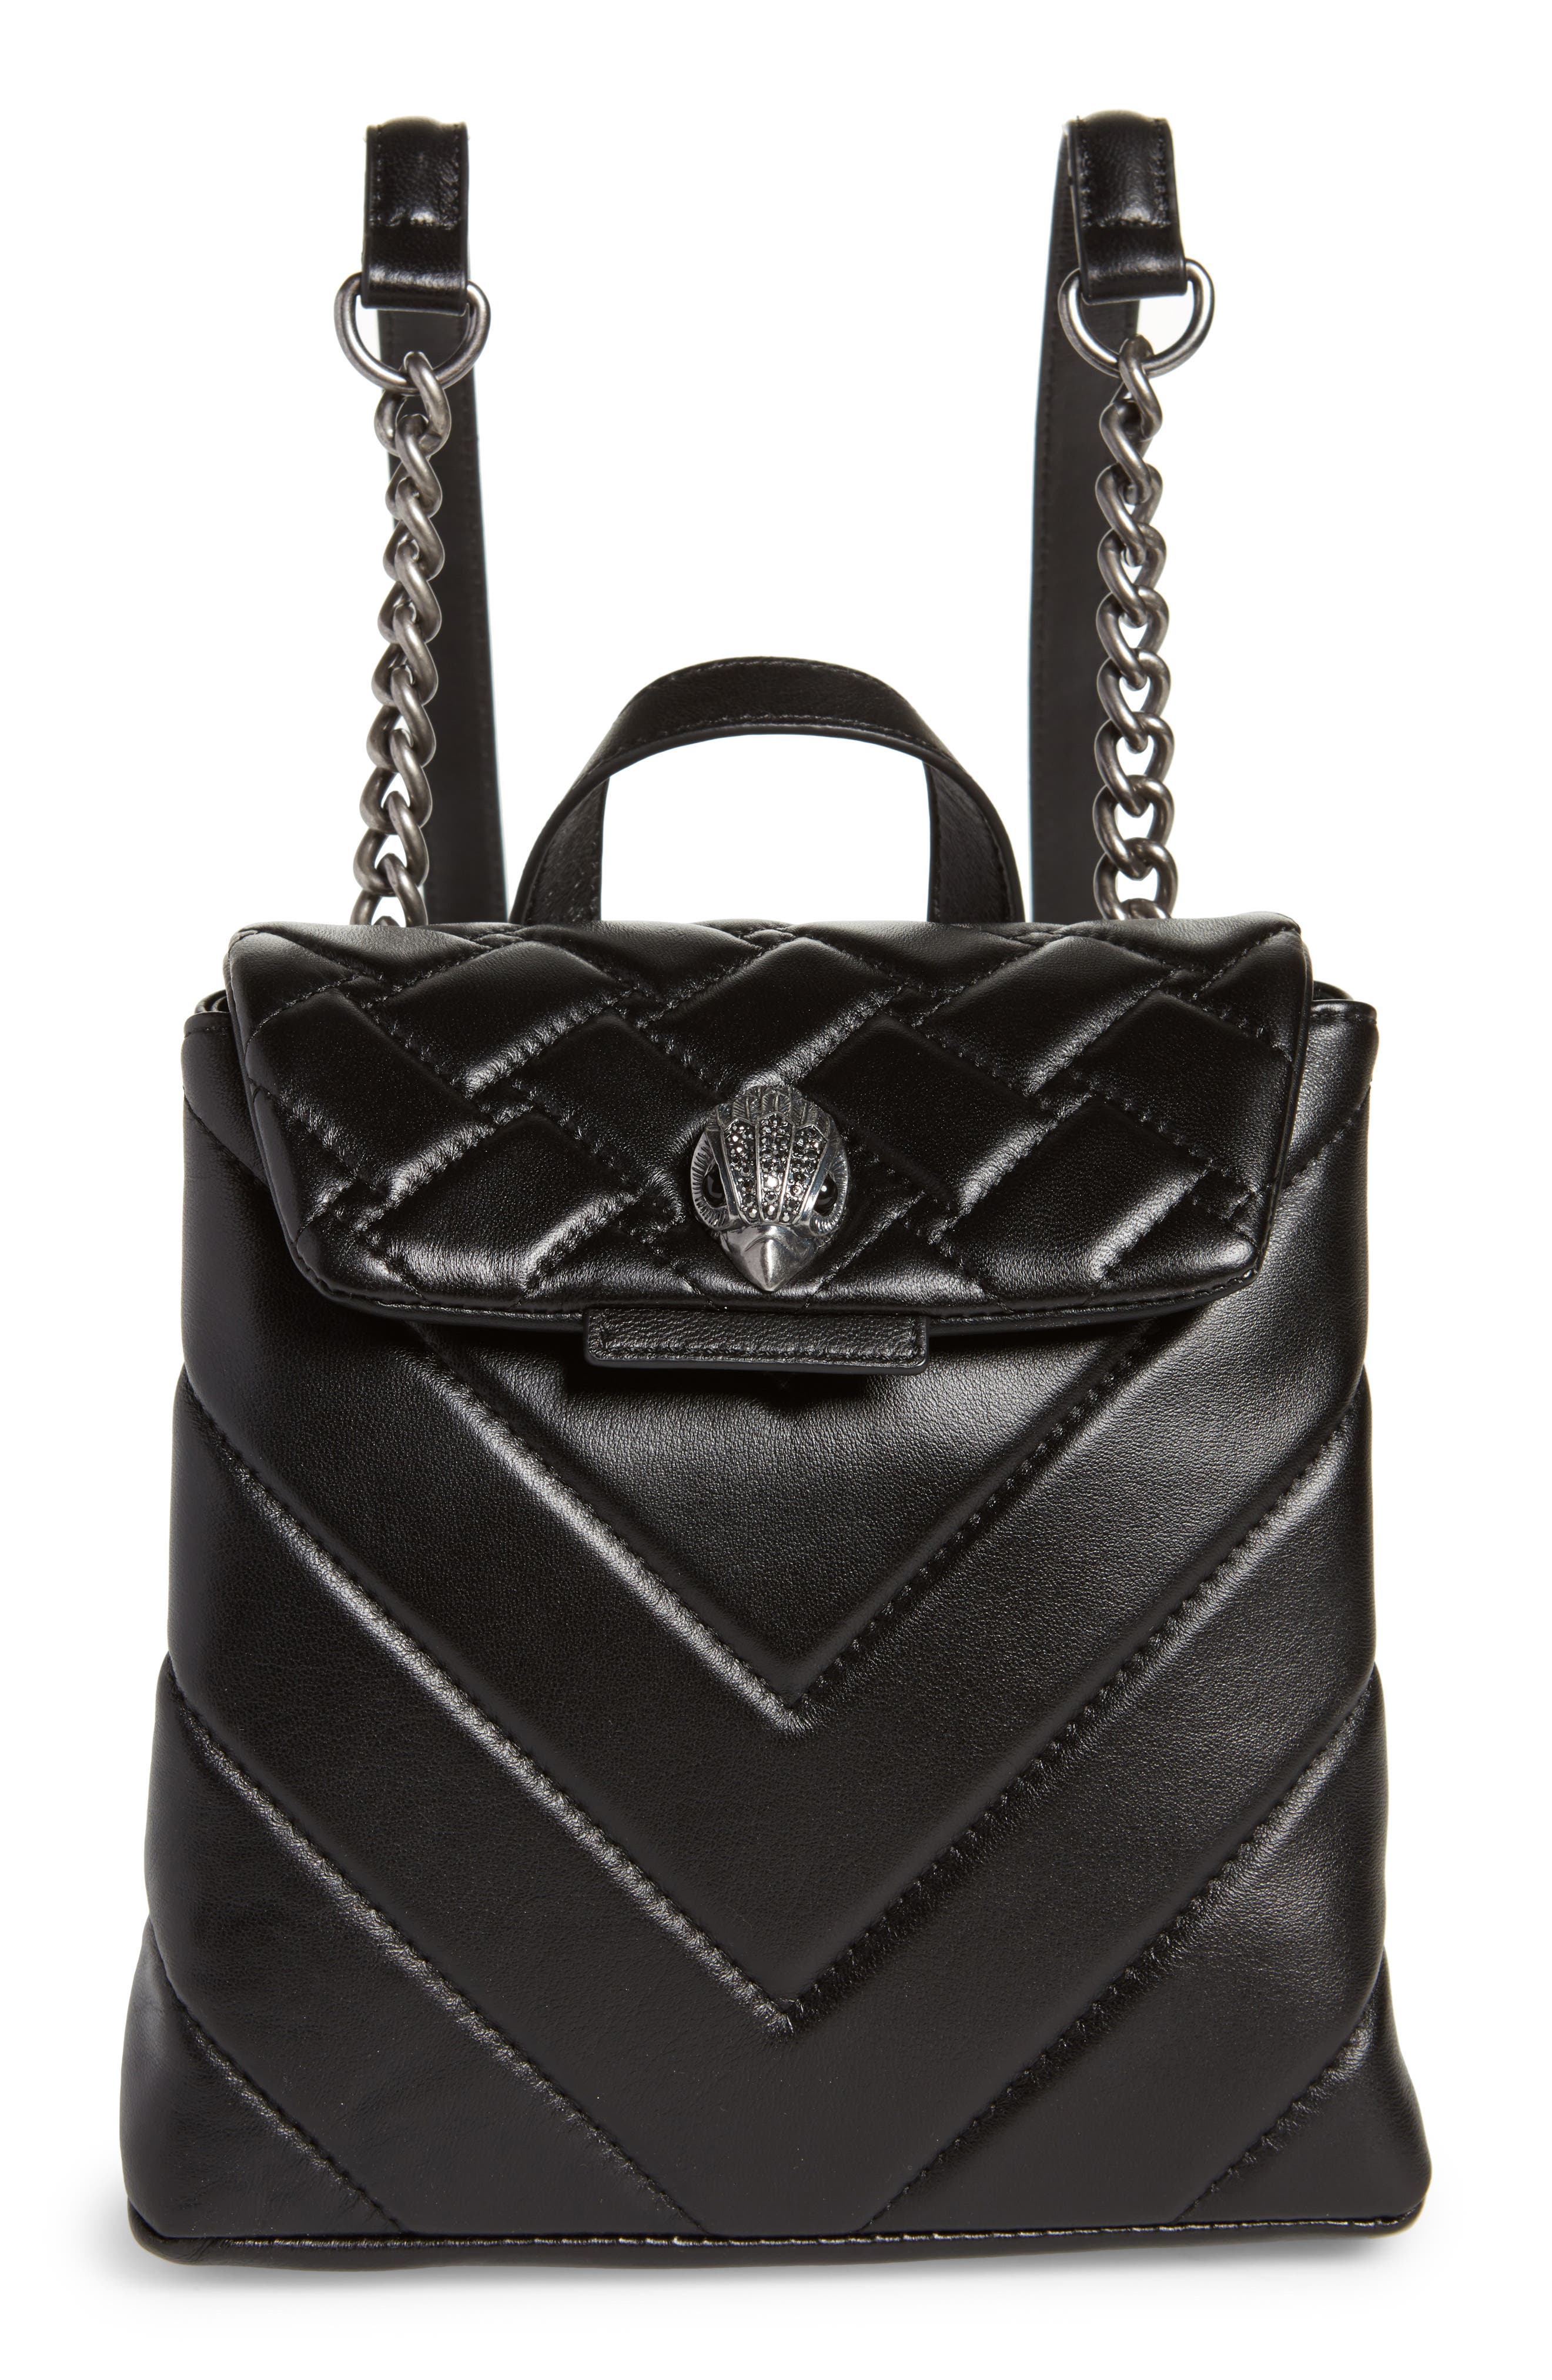 4246388a9670 Handbags   Accessories  Sale